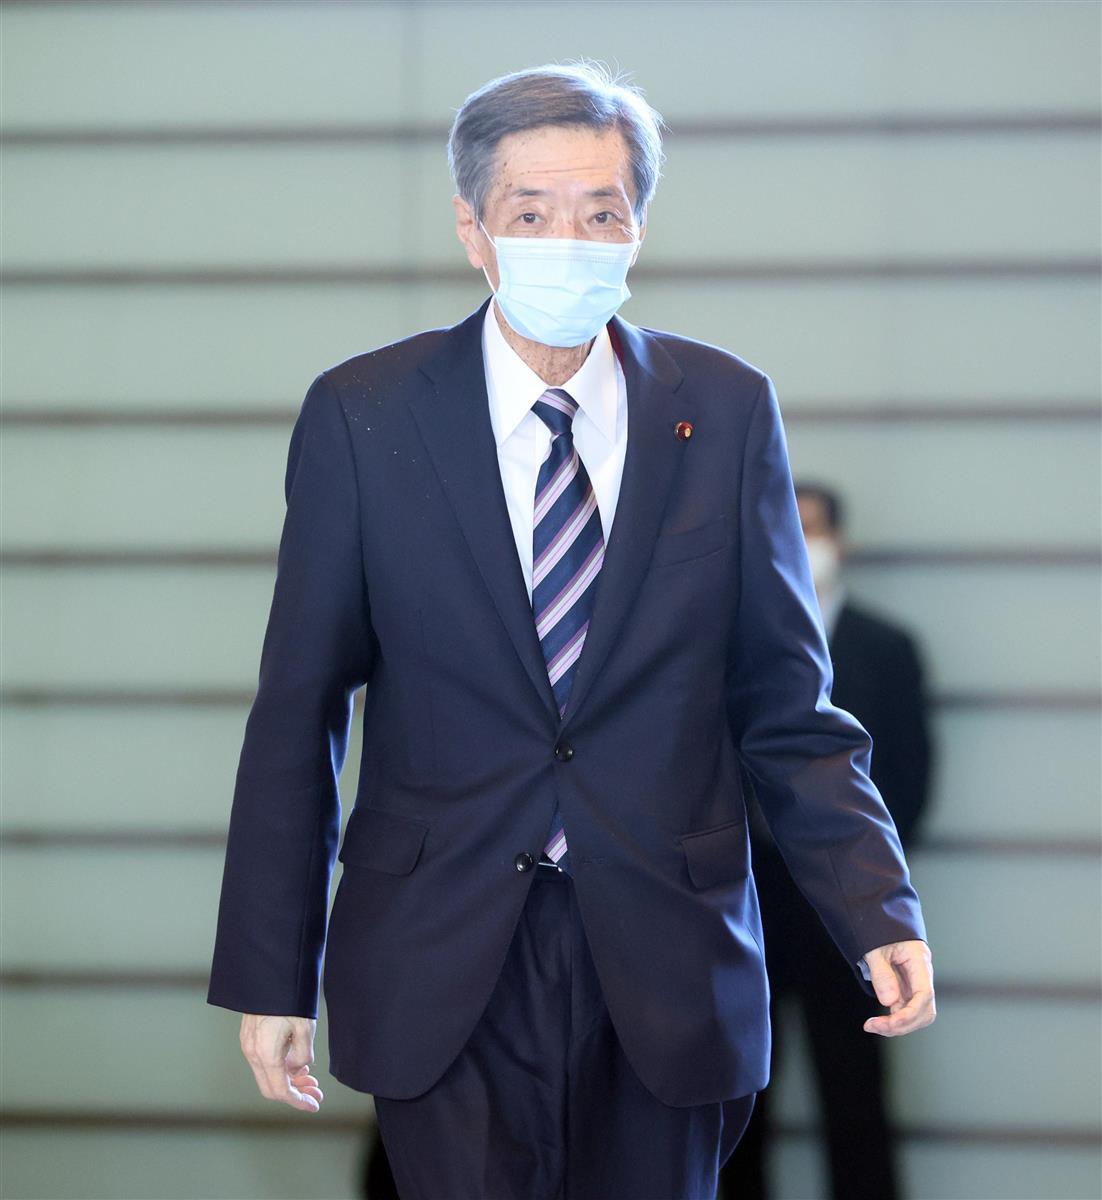 自民・竹下元総務会長、山田内閣広報官に猛省促す「7万円も何食…